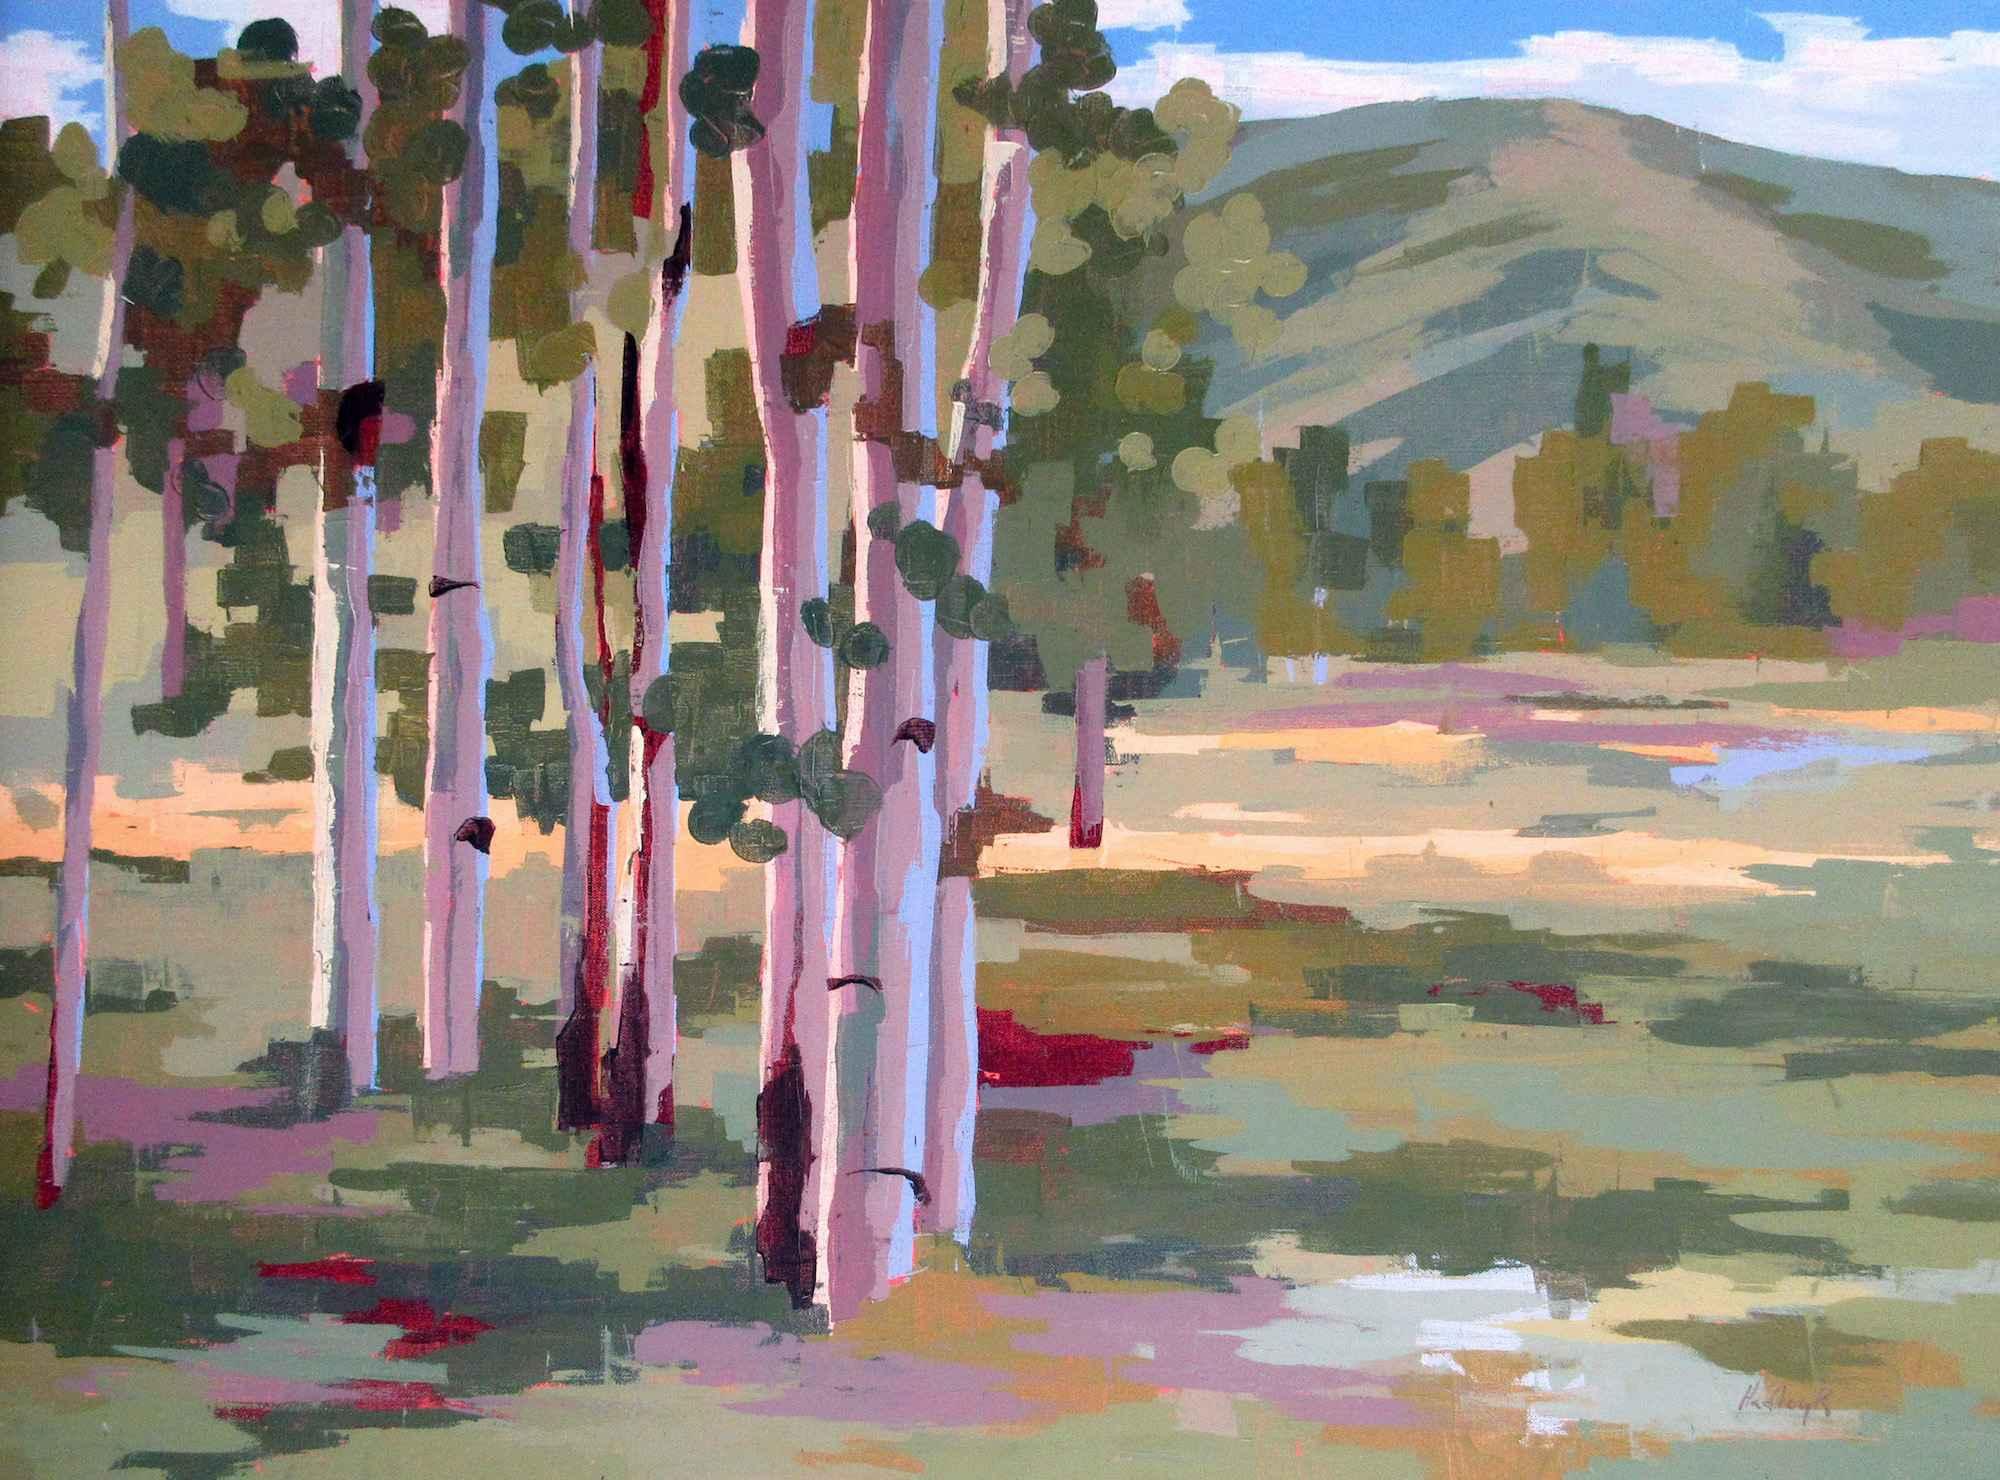 One Summer Day by  Hadley Rampton - Masterpiece Online